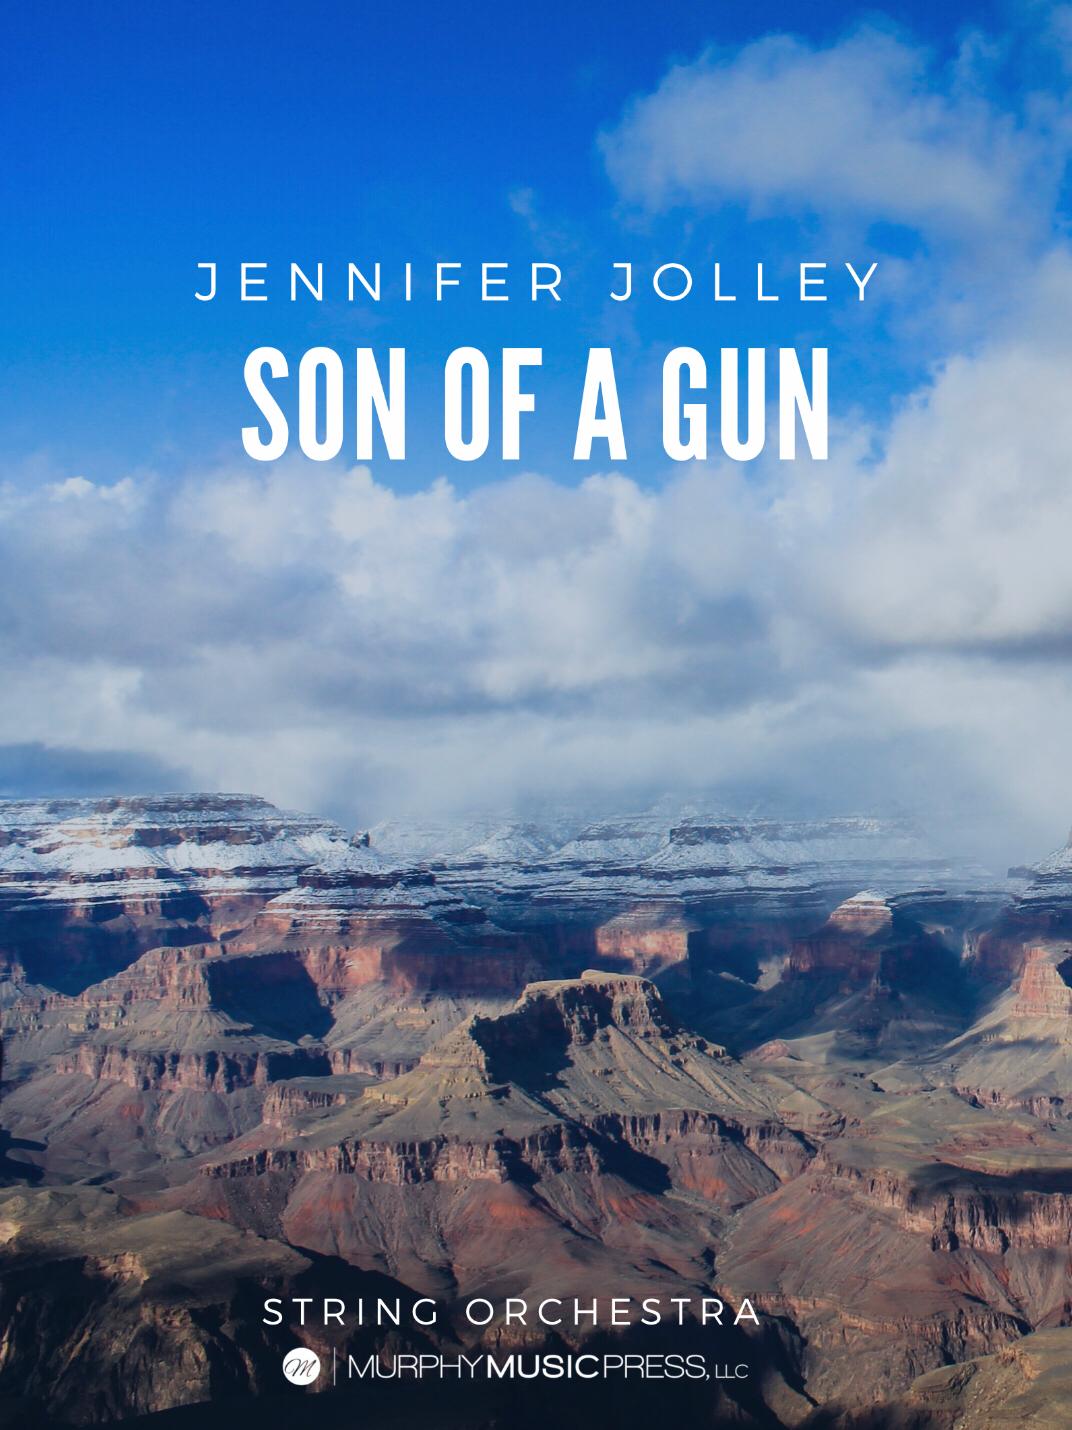 Son Of A Gun (String Orchestra Version) by Jennifer Jolley